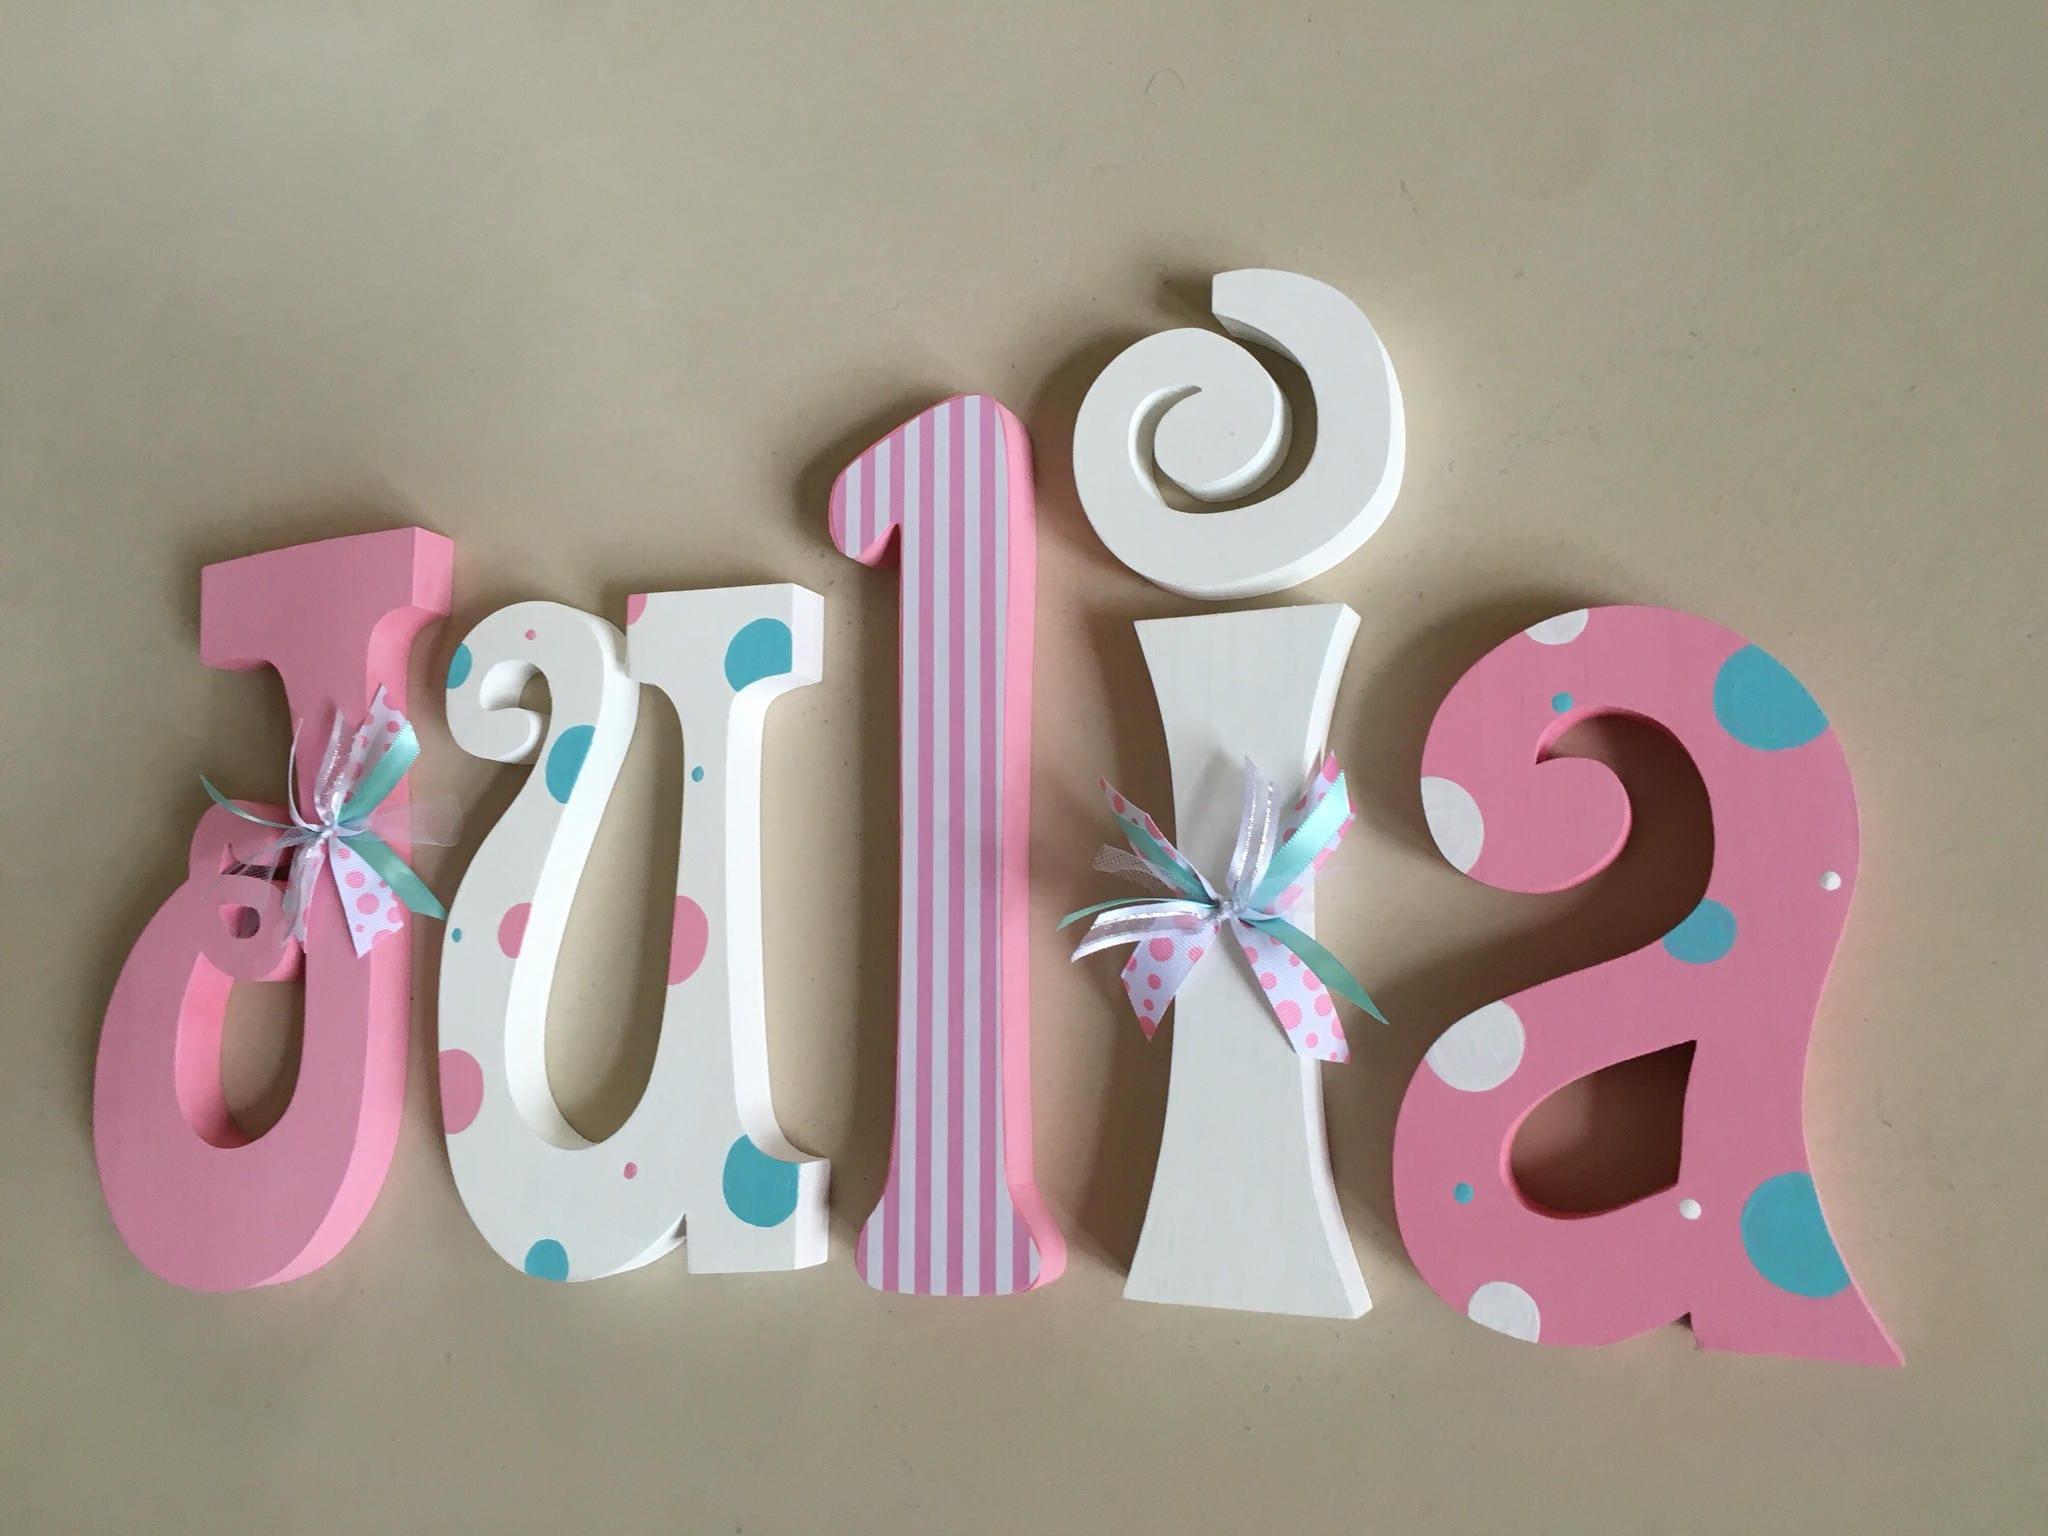 Nursery Letters Nursery Wall Hanging Letters Nursery Decor